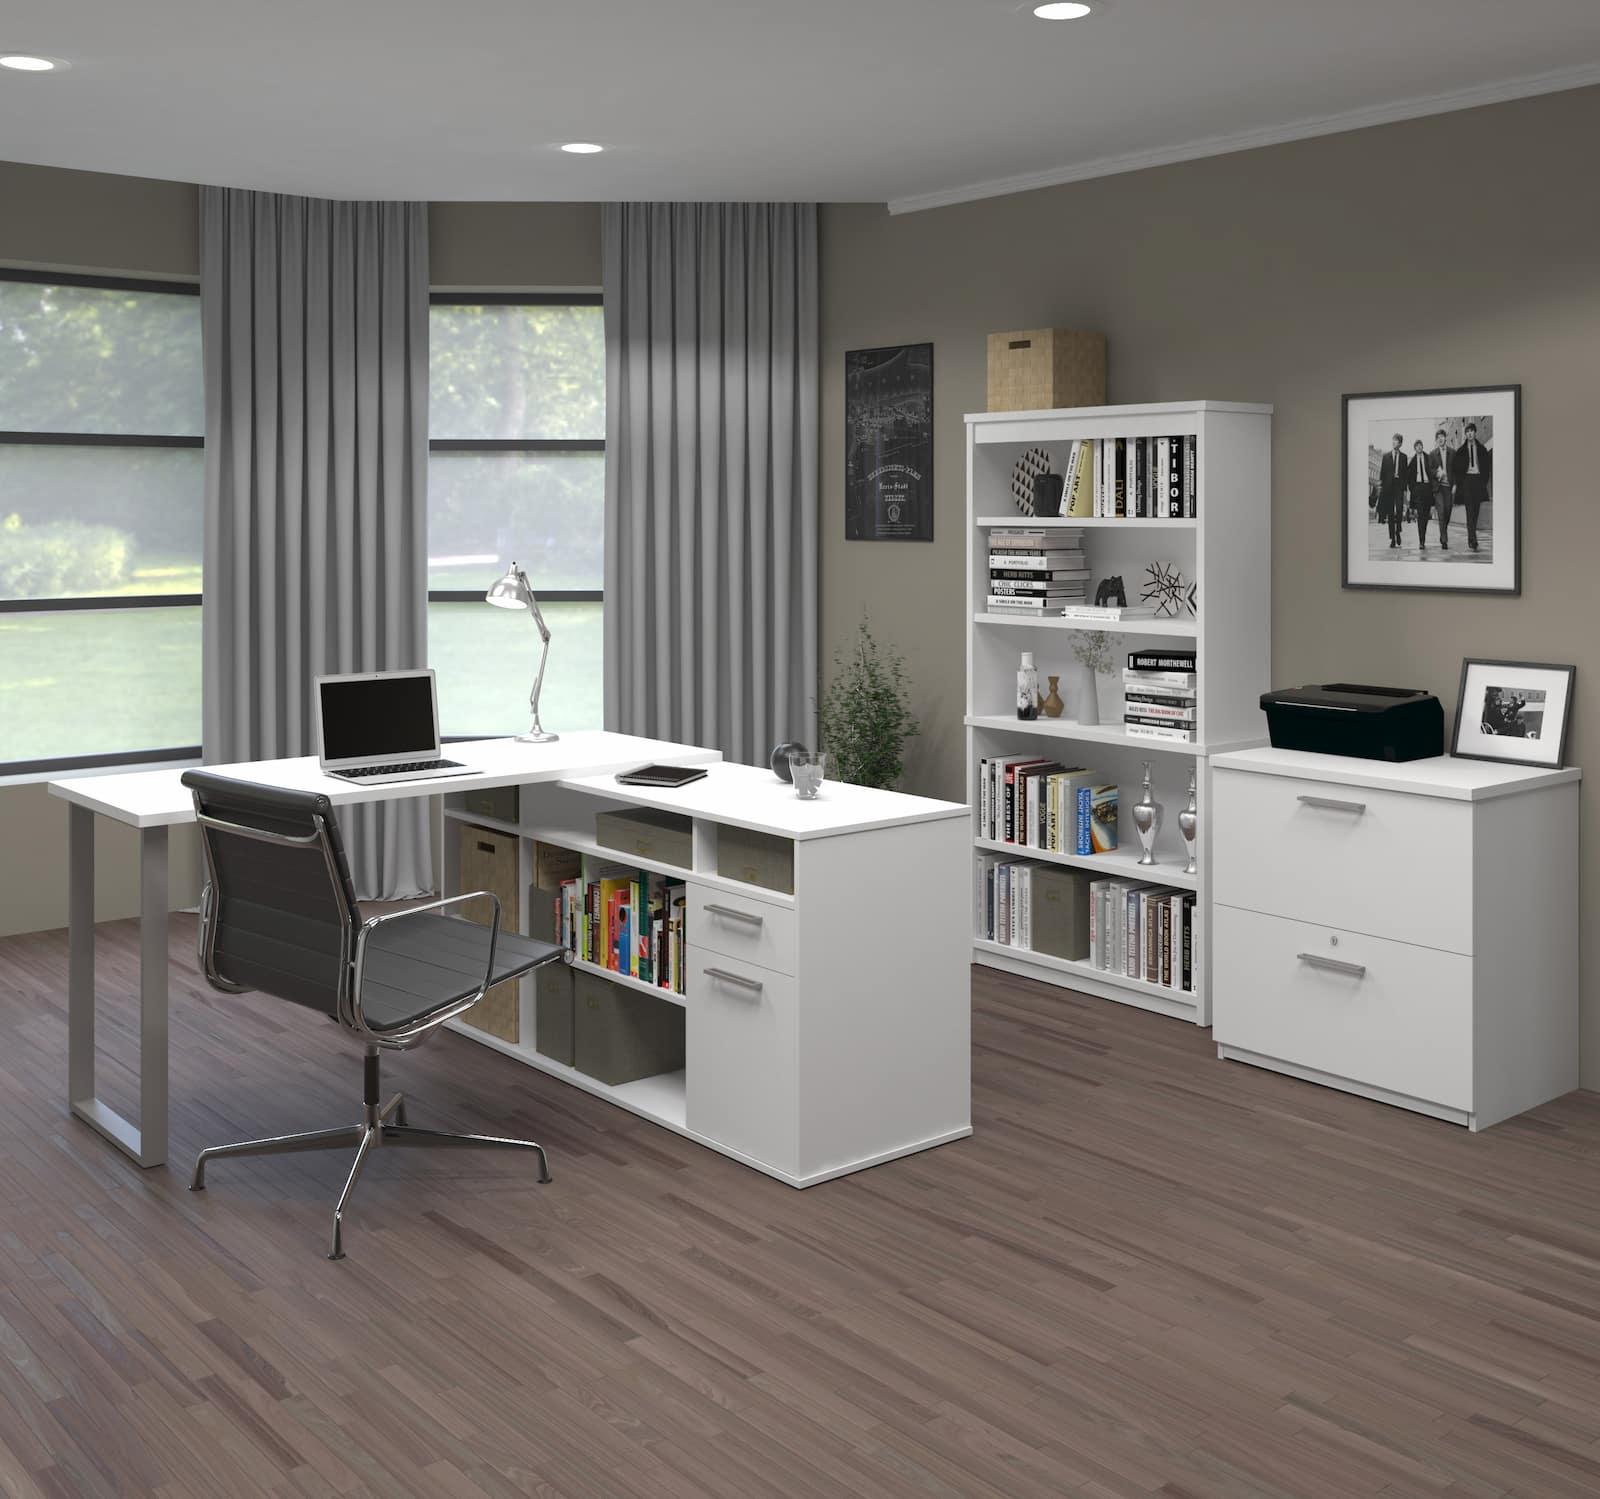 white table, credenza, bookcase and file cabinet